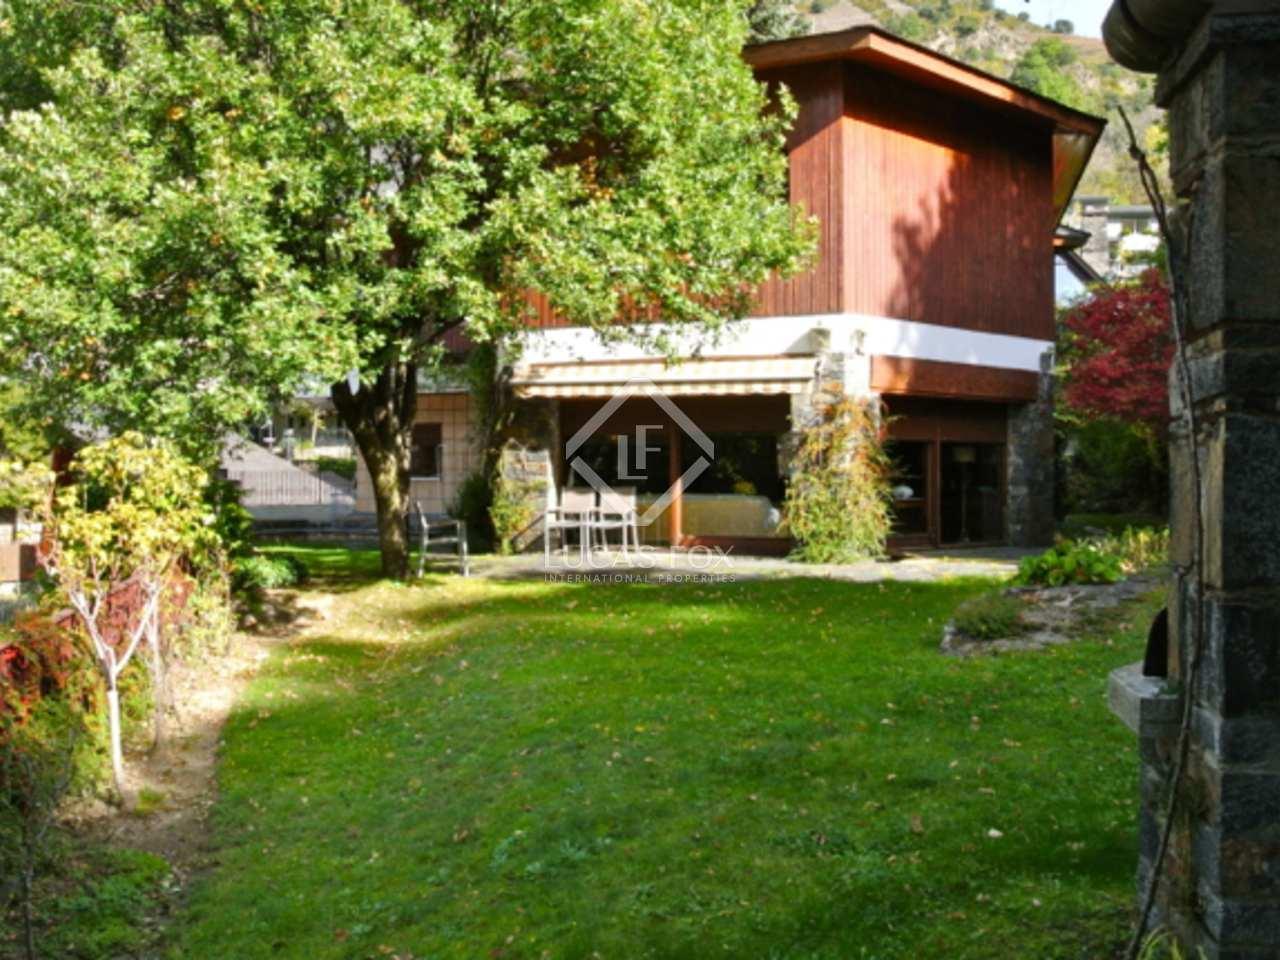 560m haus villa zum verkauf in andorra la vella andorra for Verkauf haus